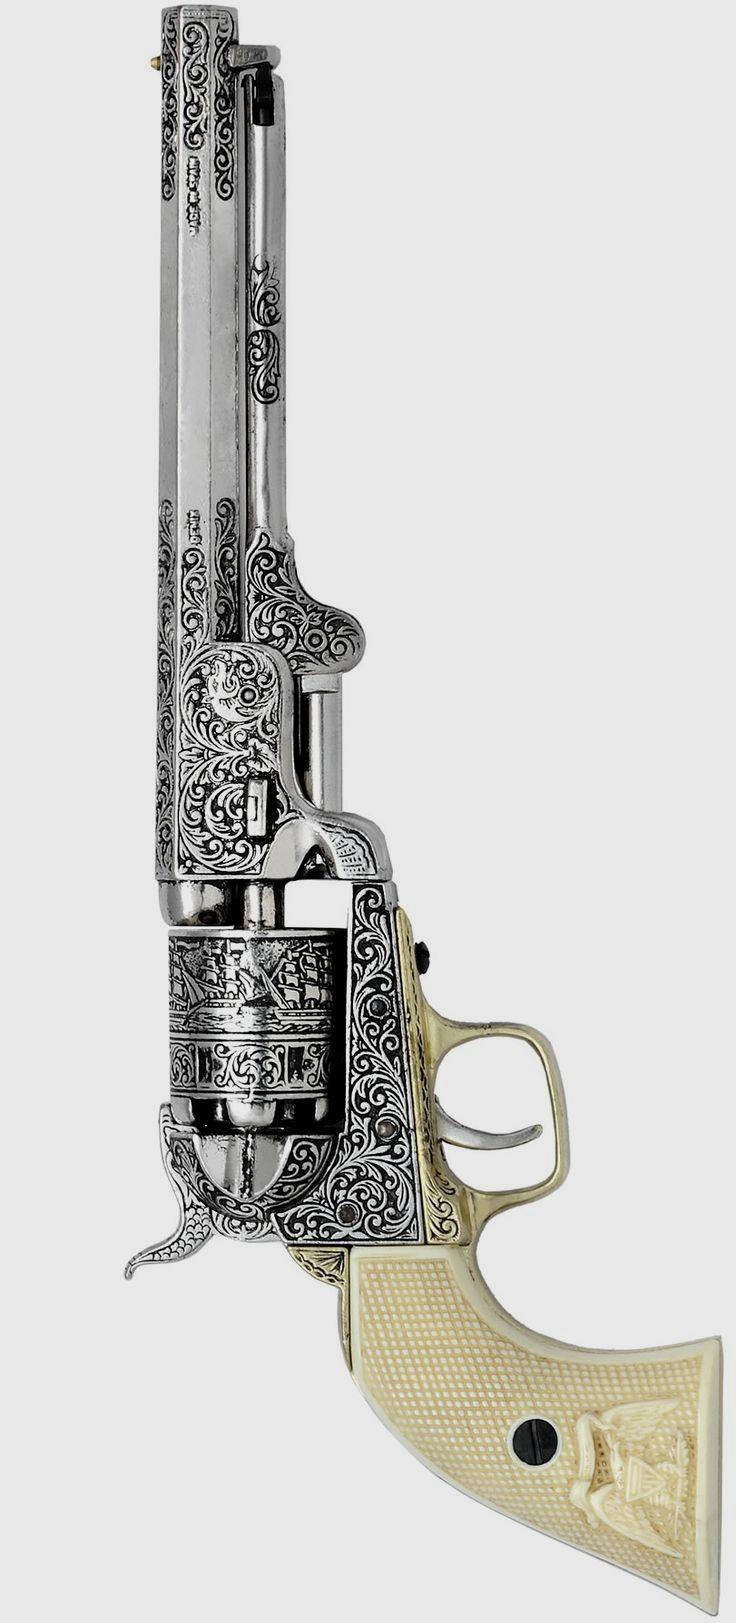 1861 Navy Colt